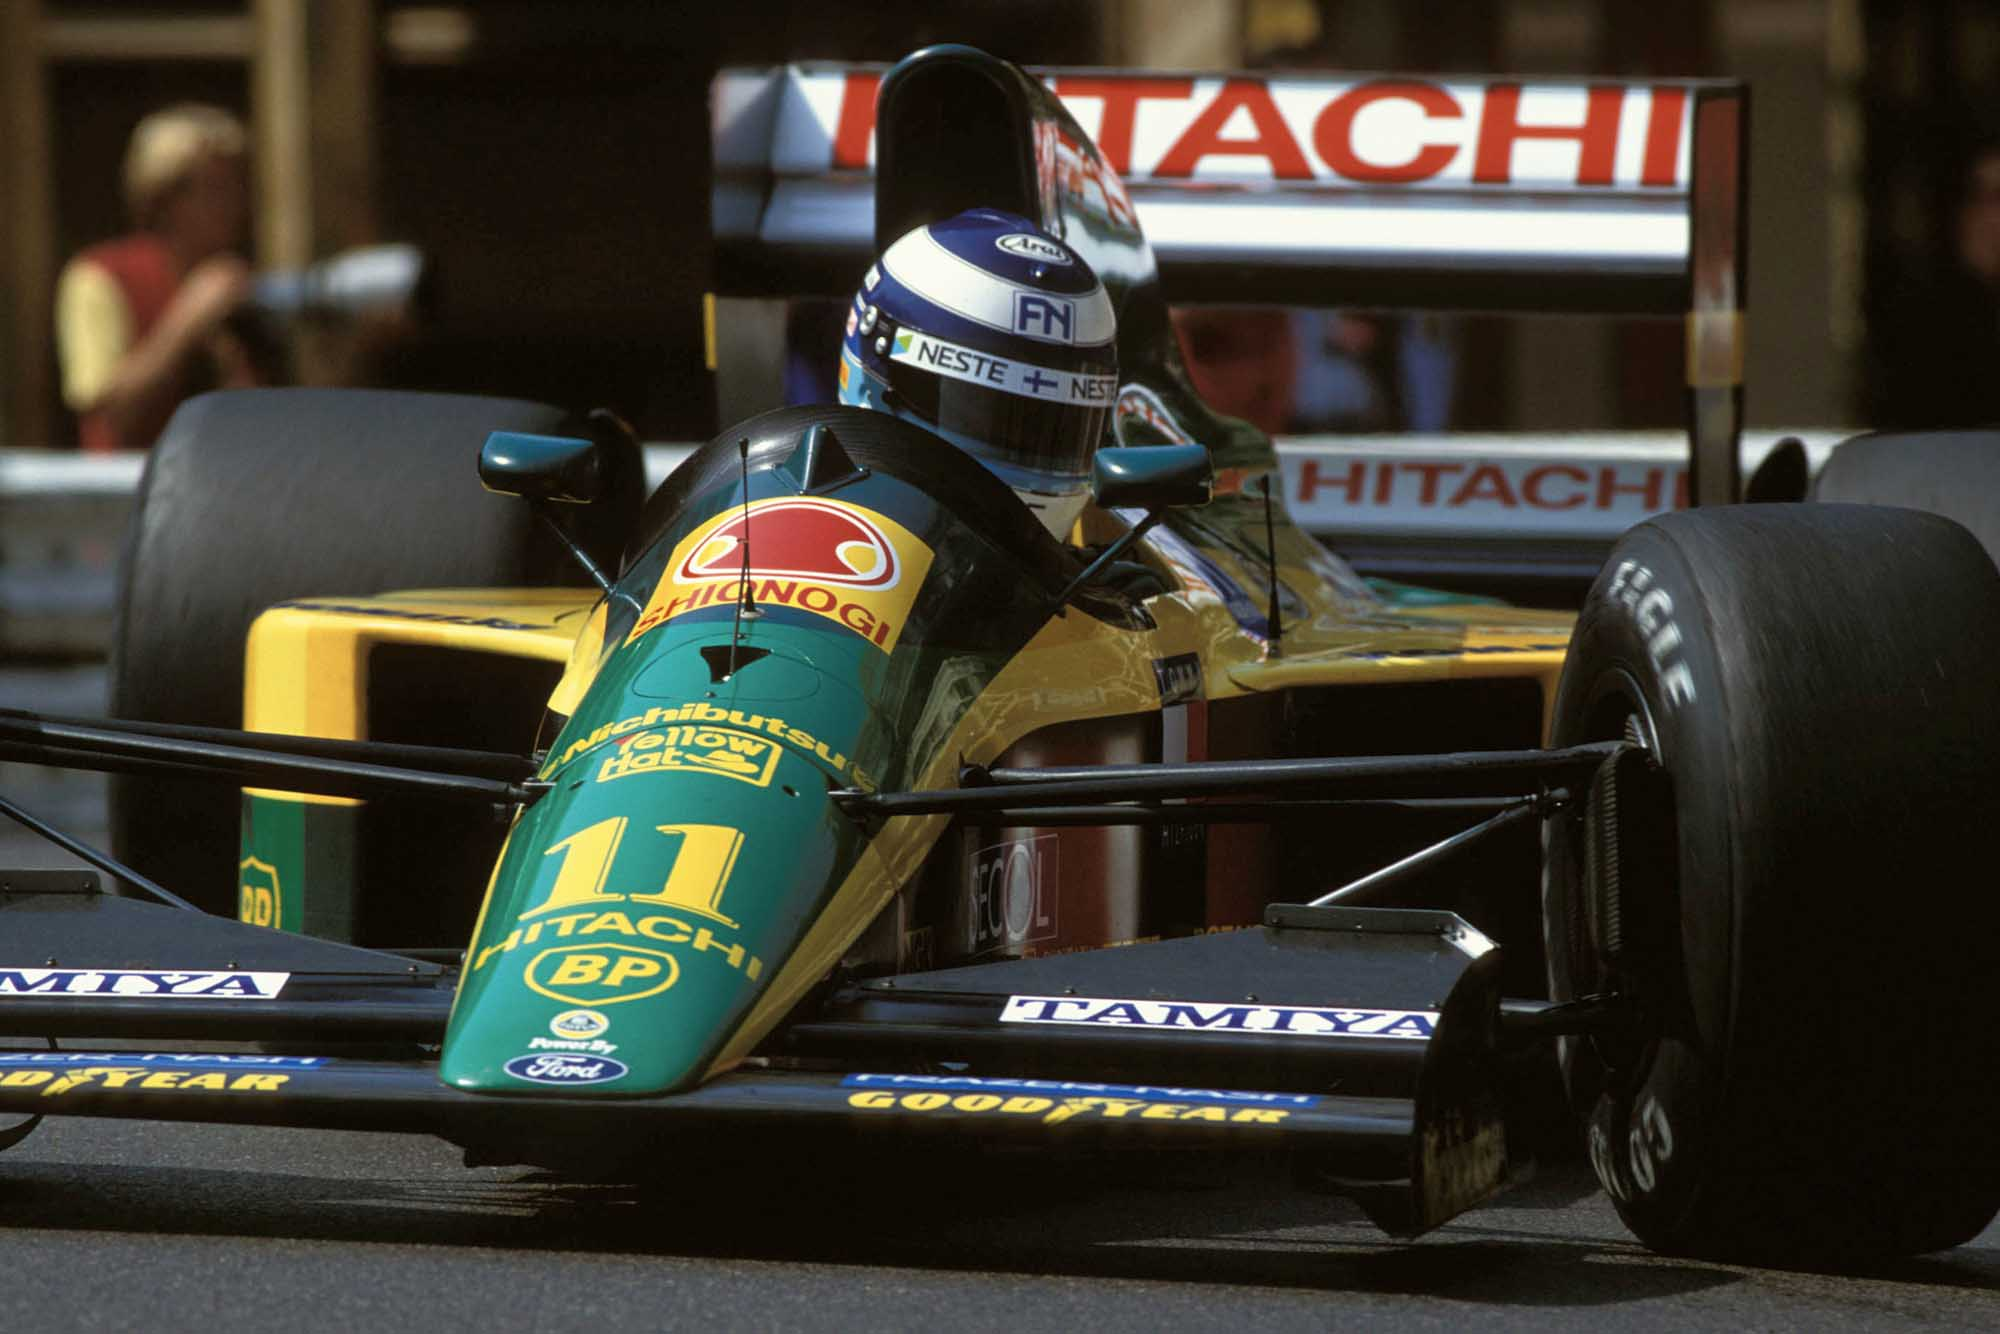 Mika Hakkinen in his Lotus at 1992 Monaco Grand Prix